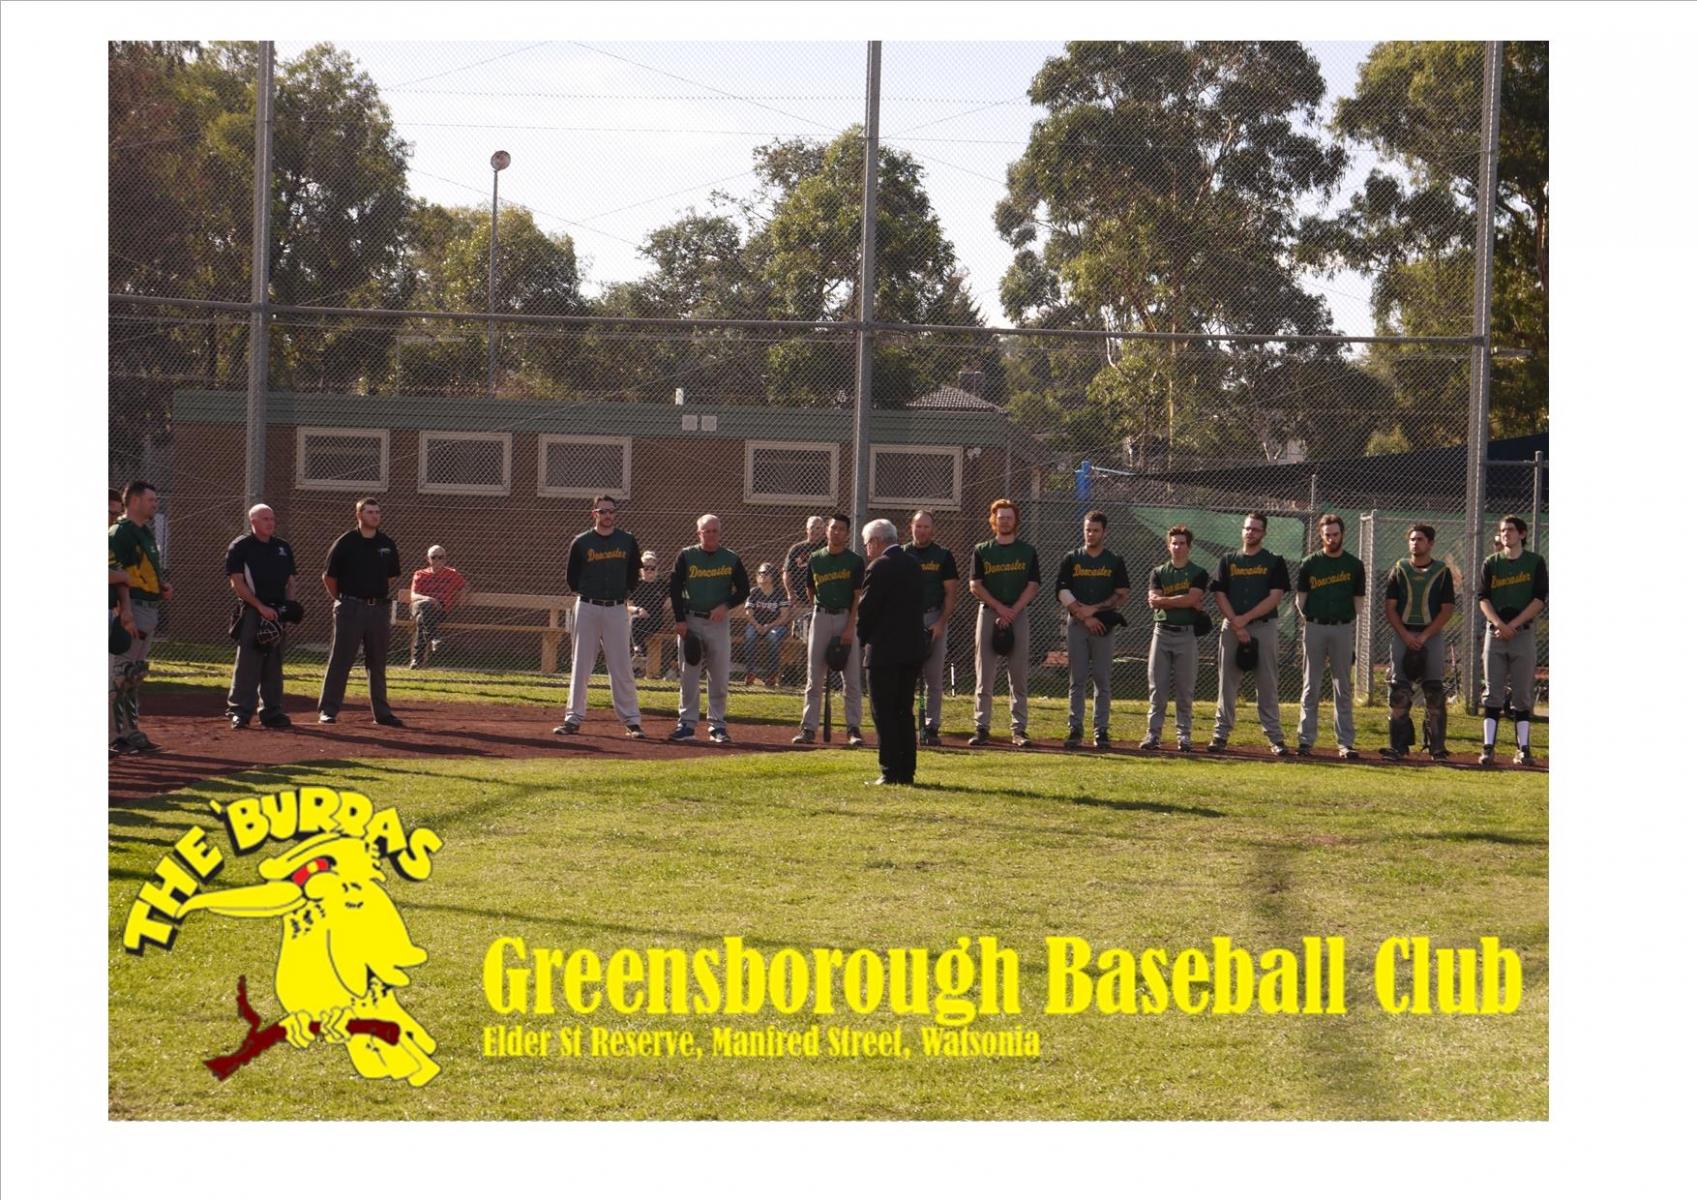 Greensborough_Baseball_Club